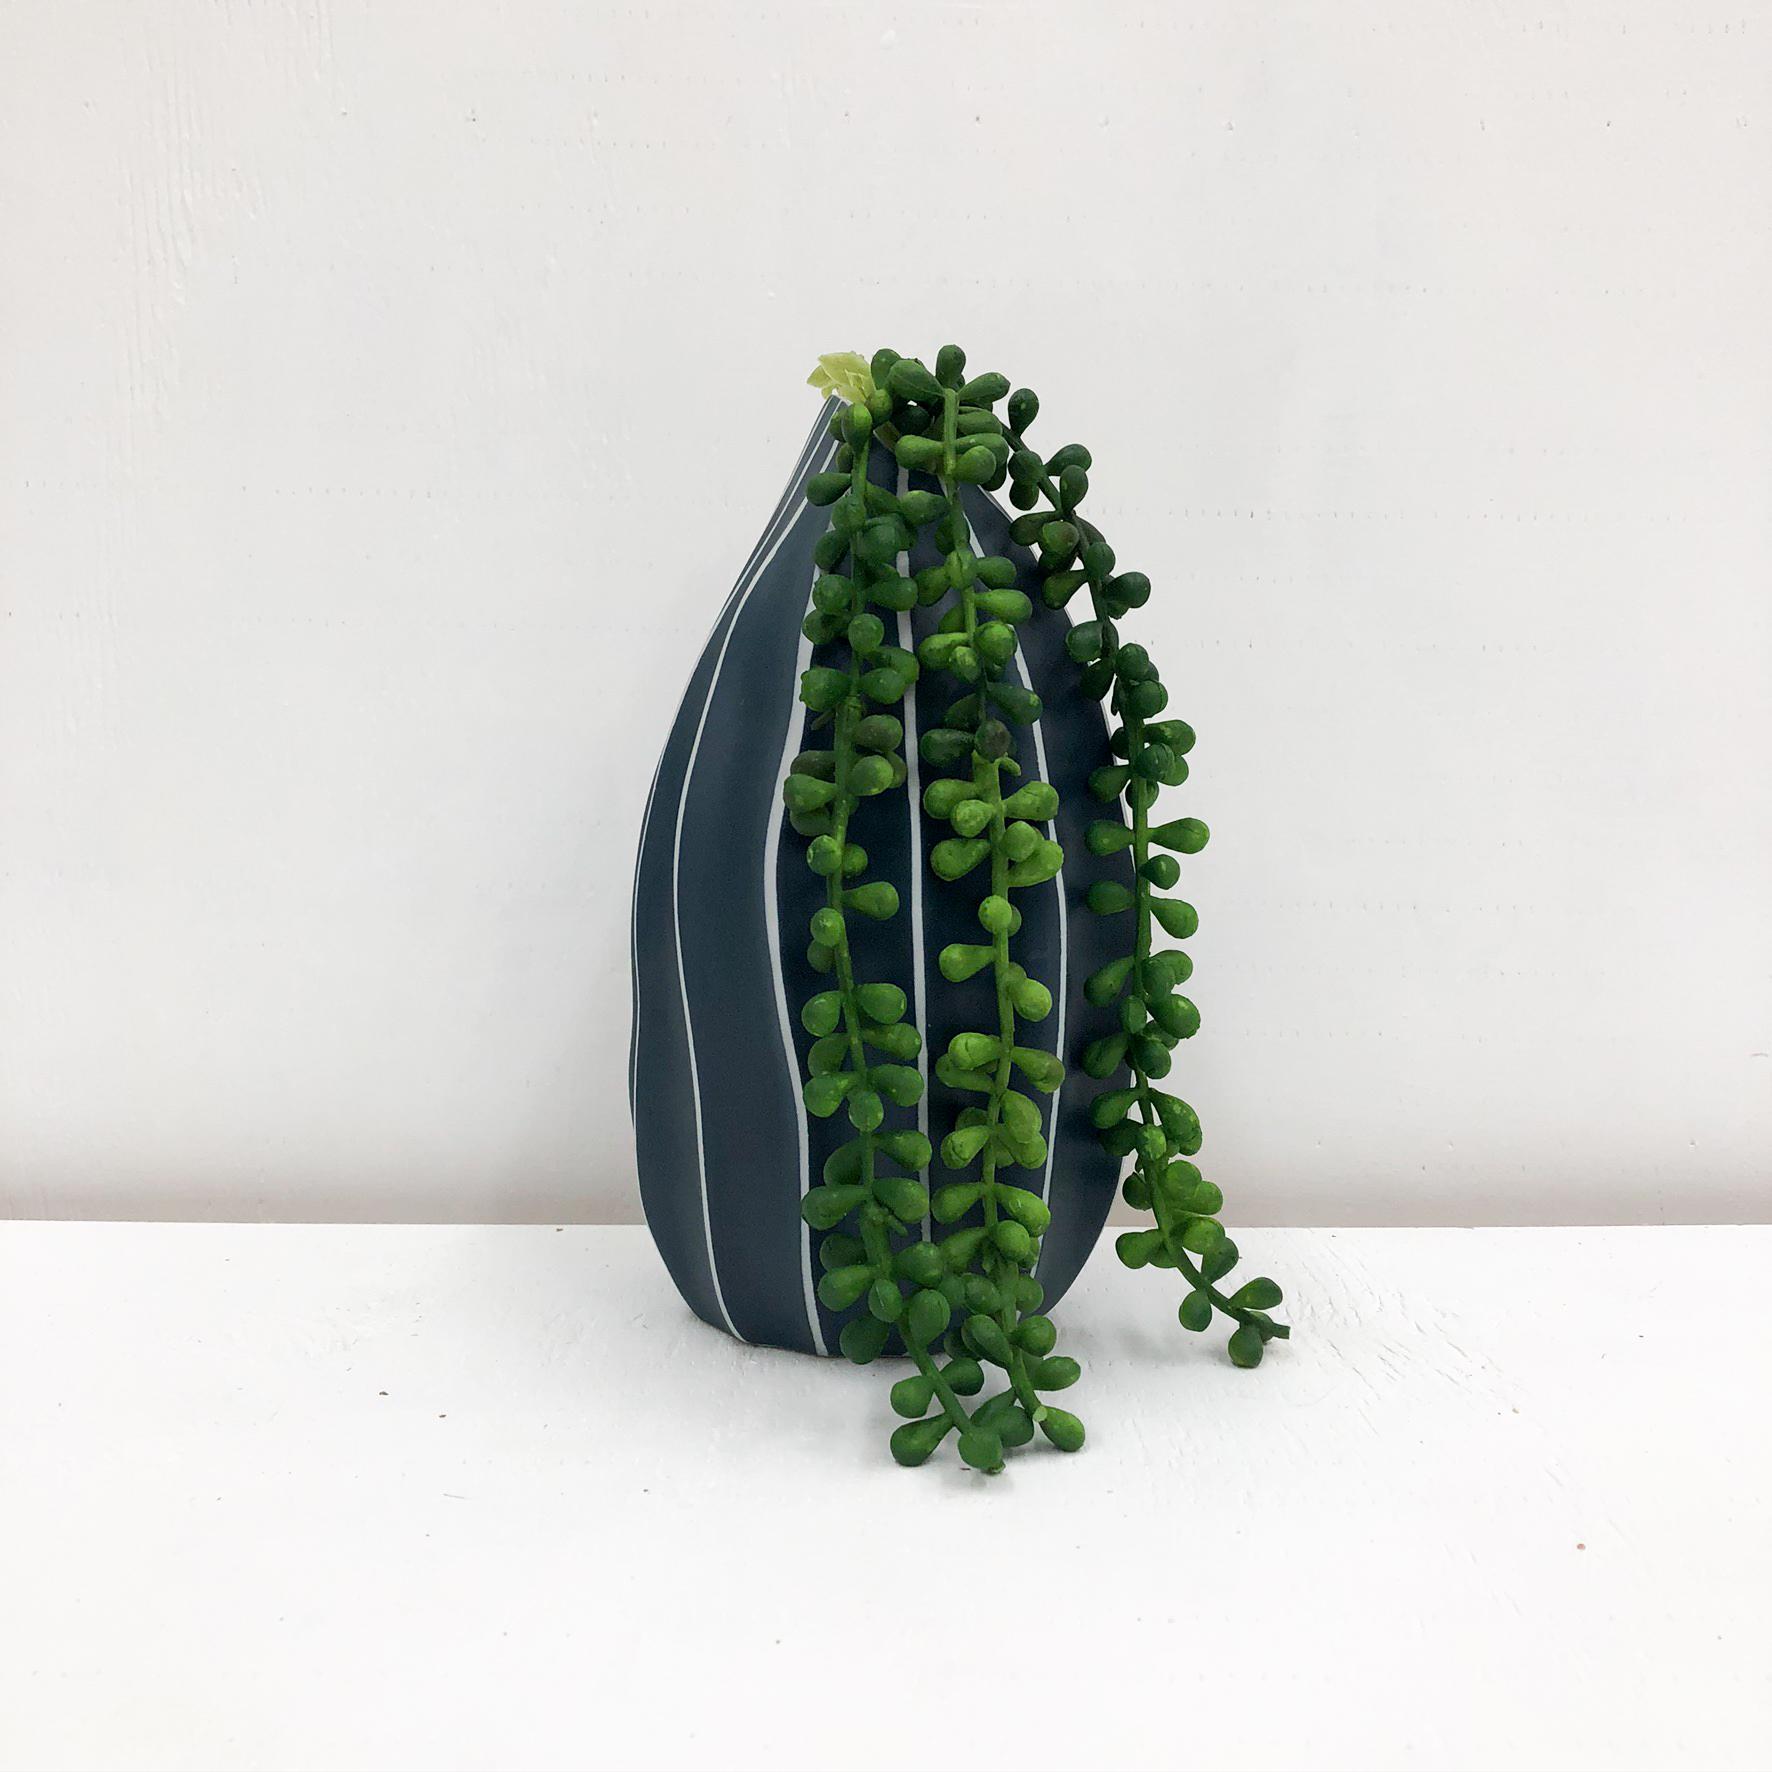 Seda S Handmade Vase - White & Blue Dots - with plant